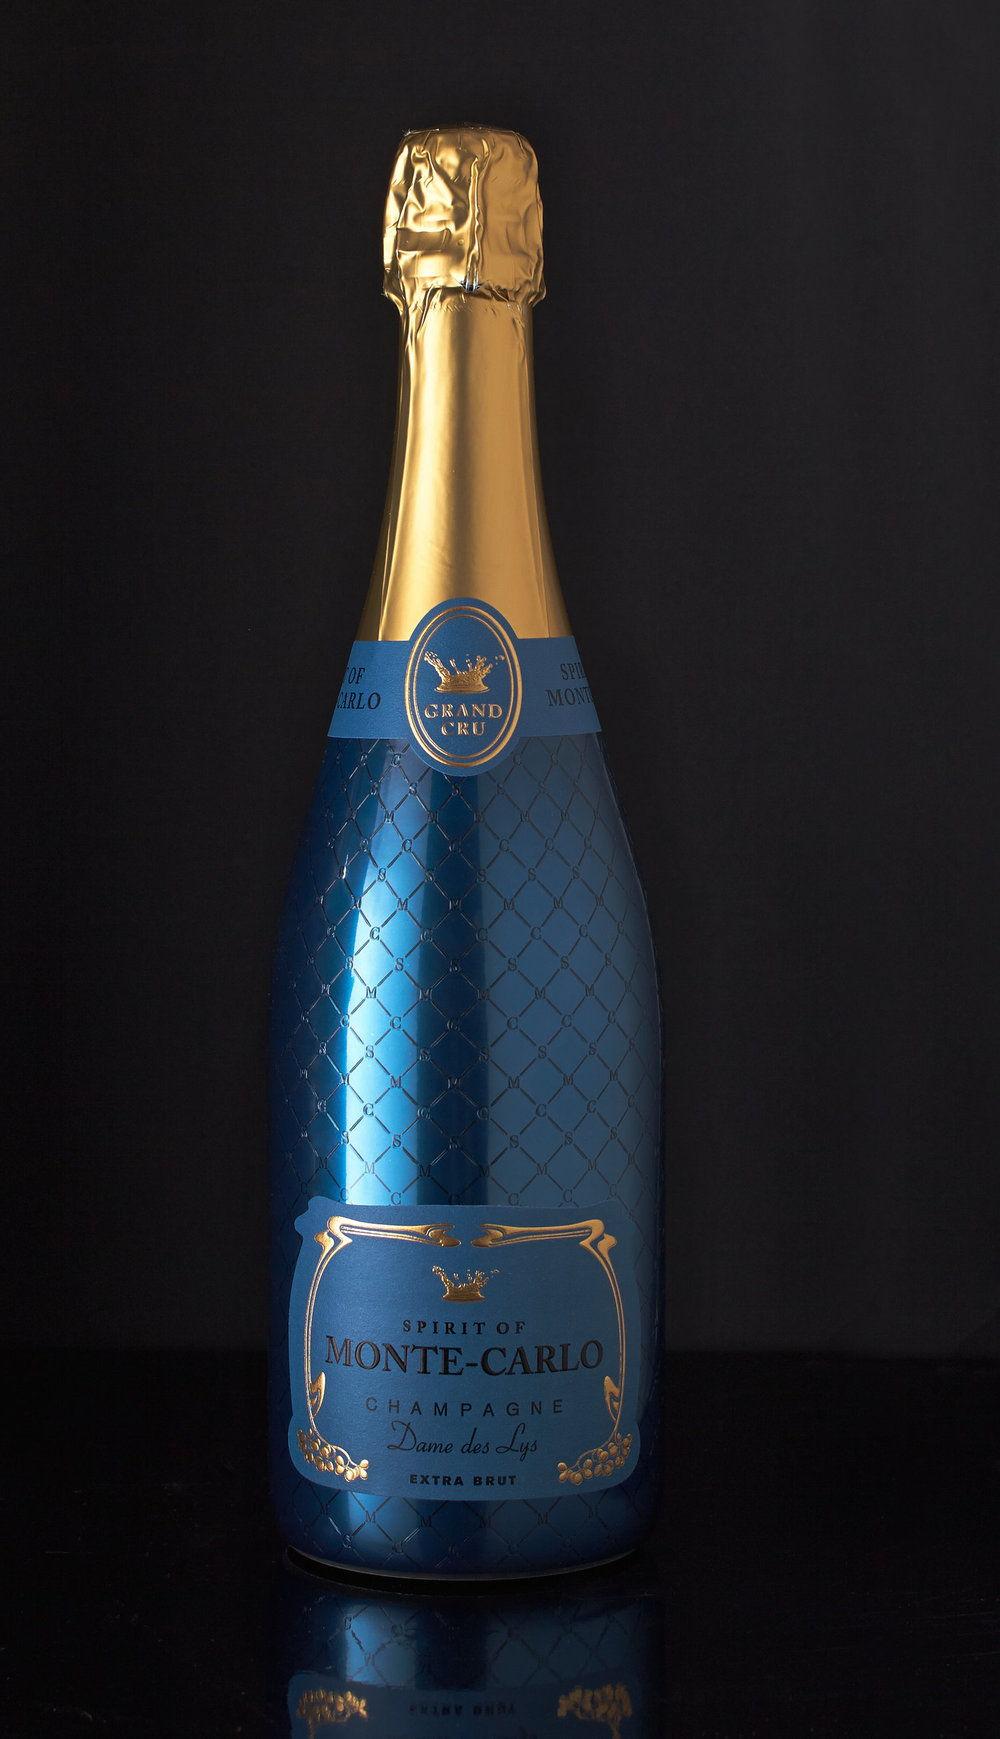 01_Champagne+Montecarlo+still+life7937.jpg